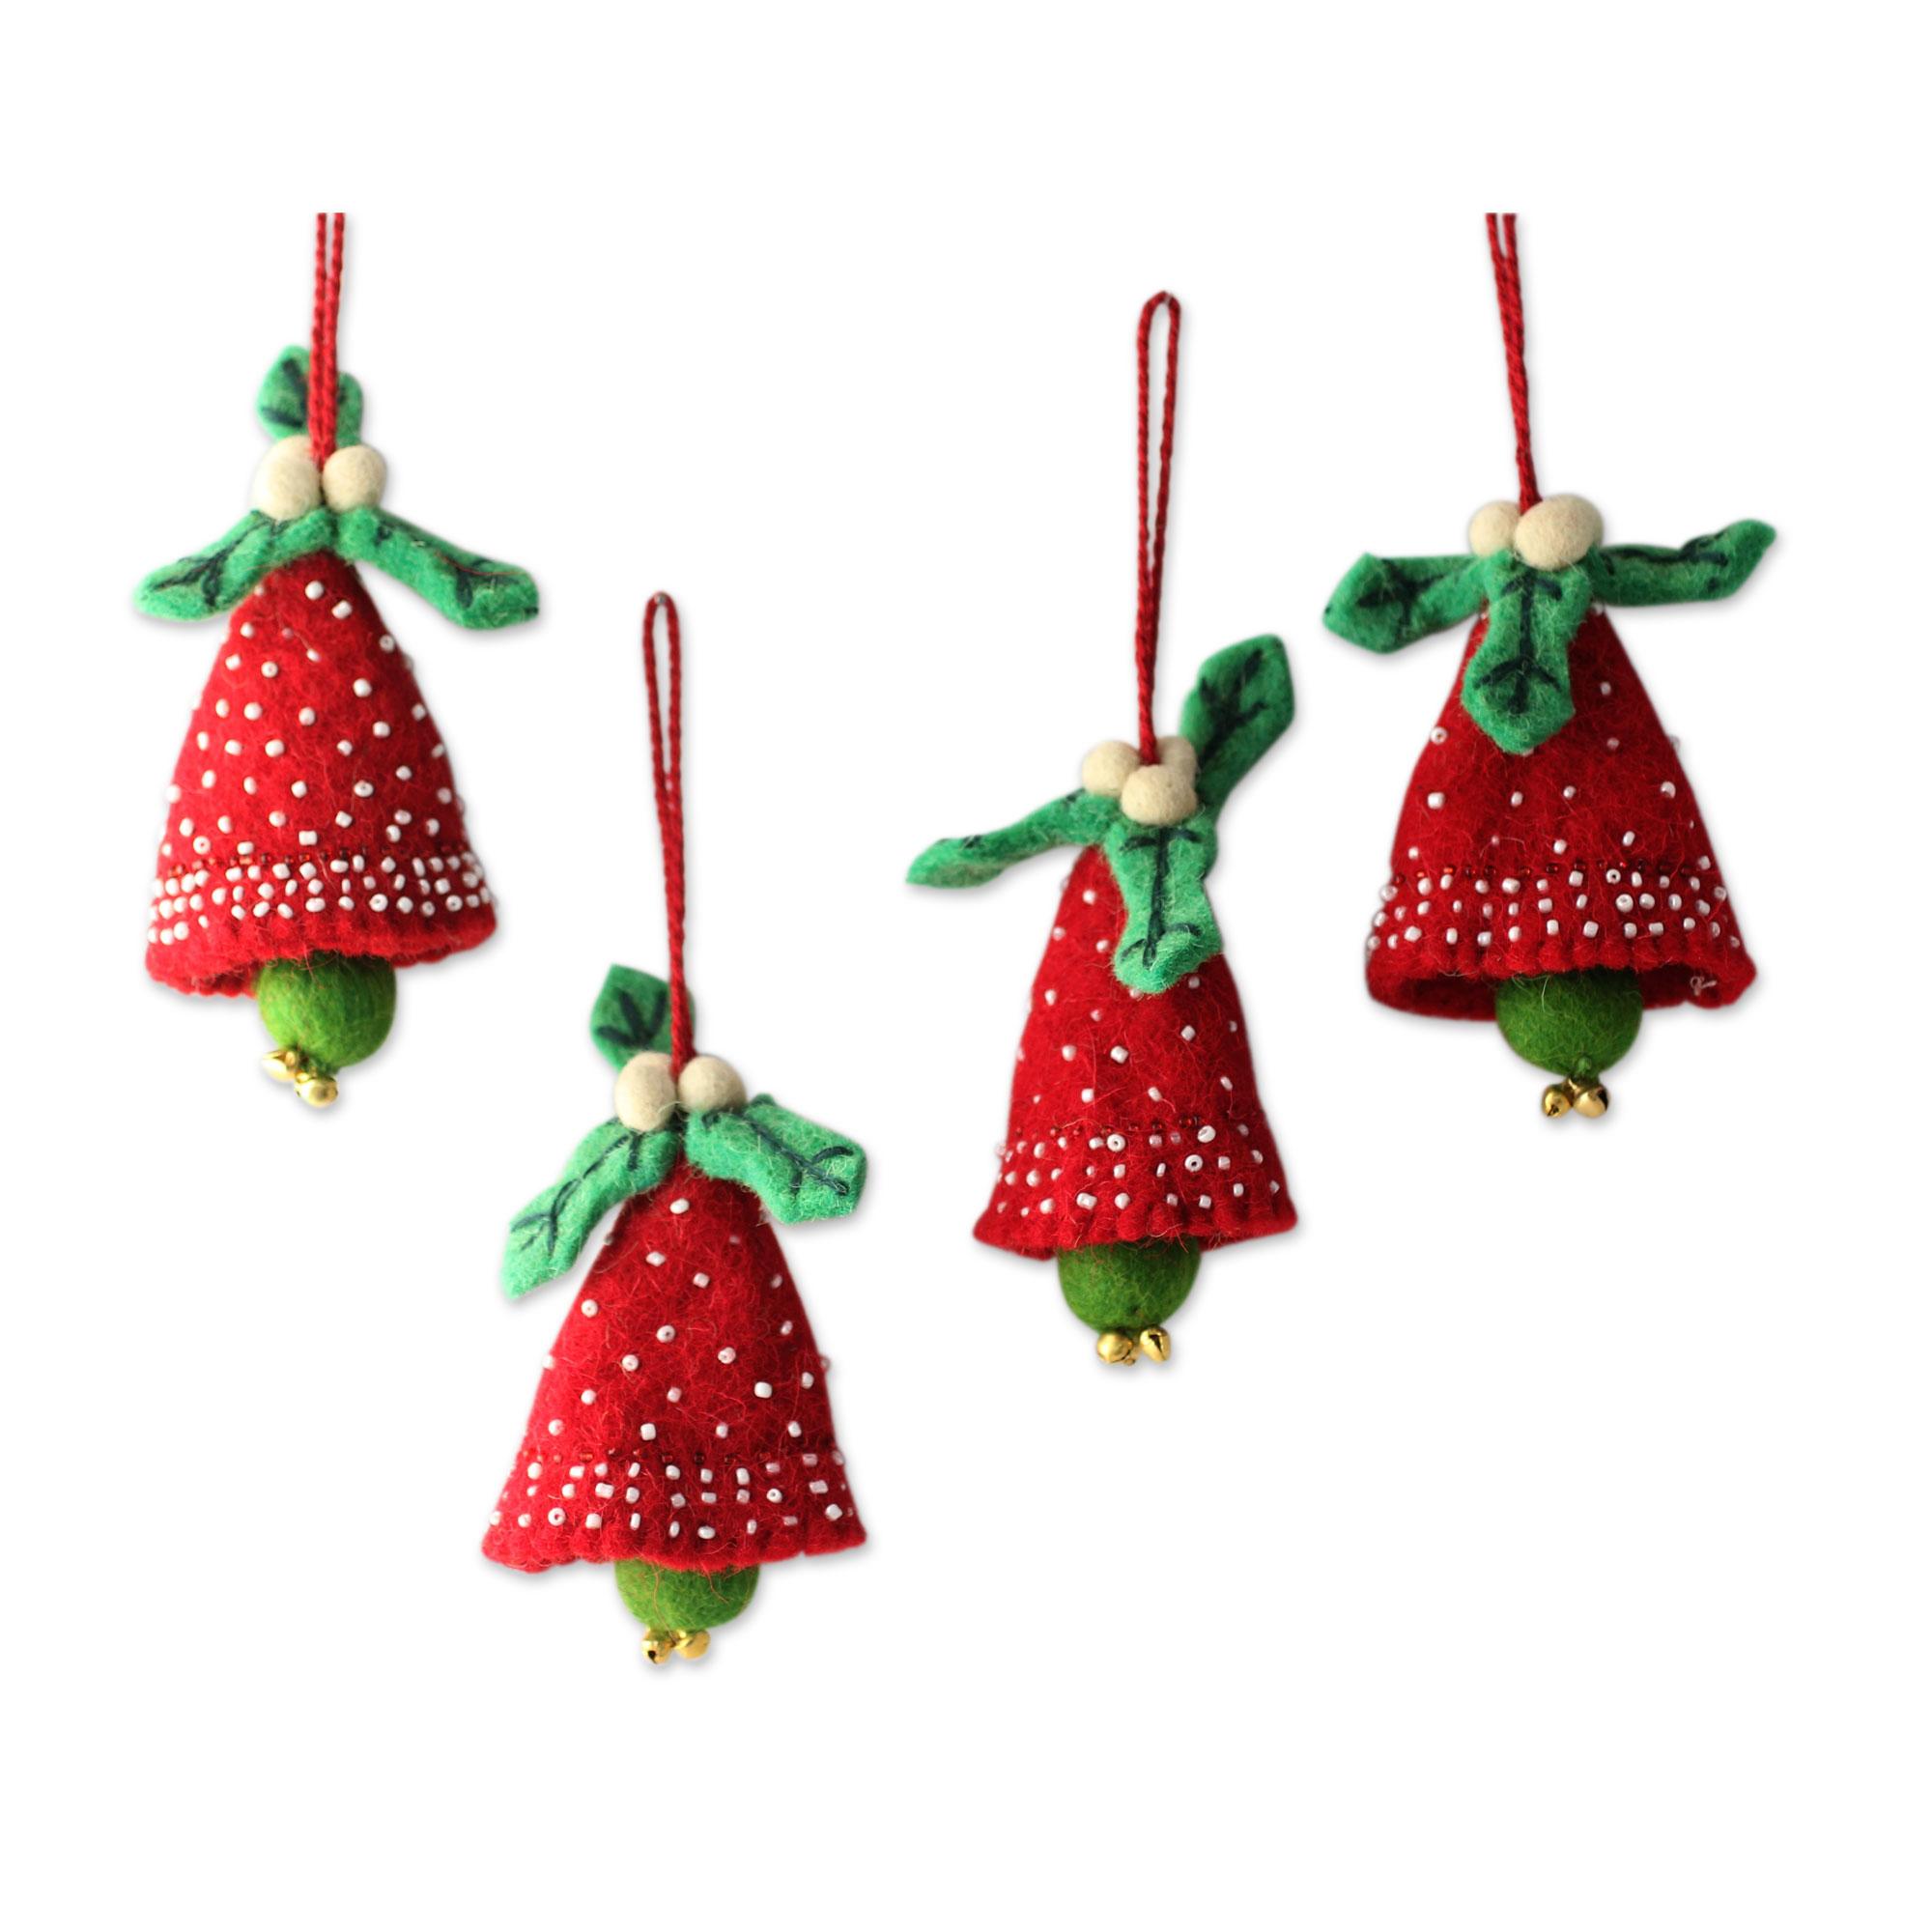 Homemade Christmas Decorations Uk: Handmade Red And Green Wool Christmas